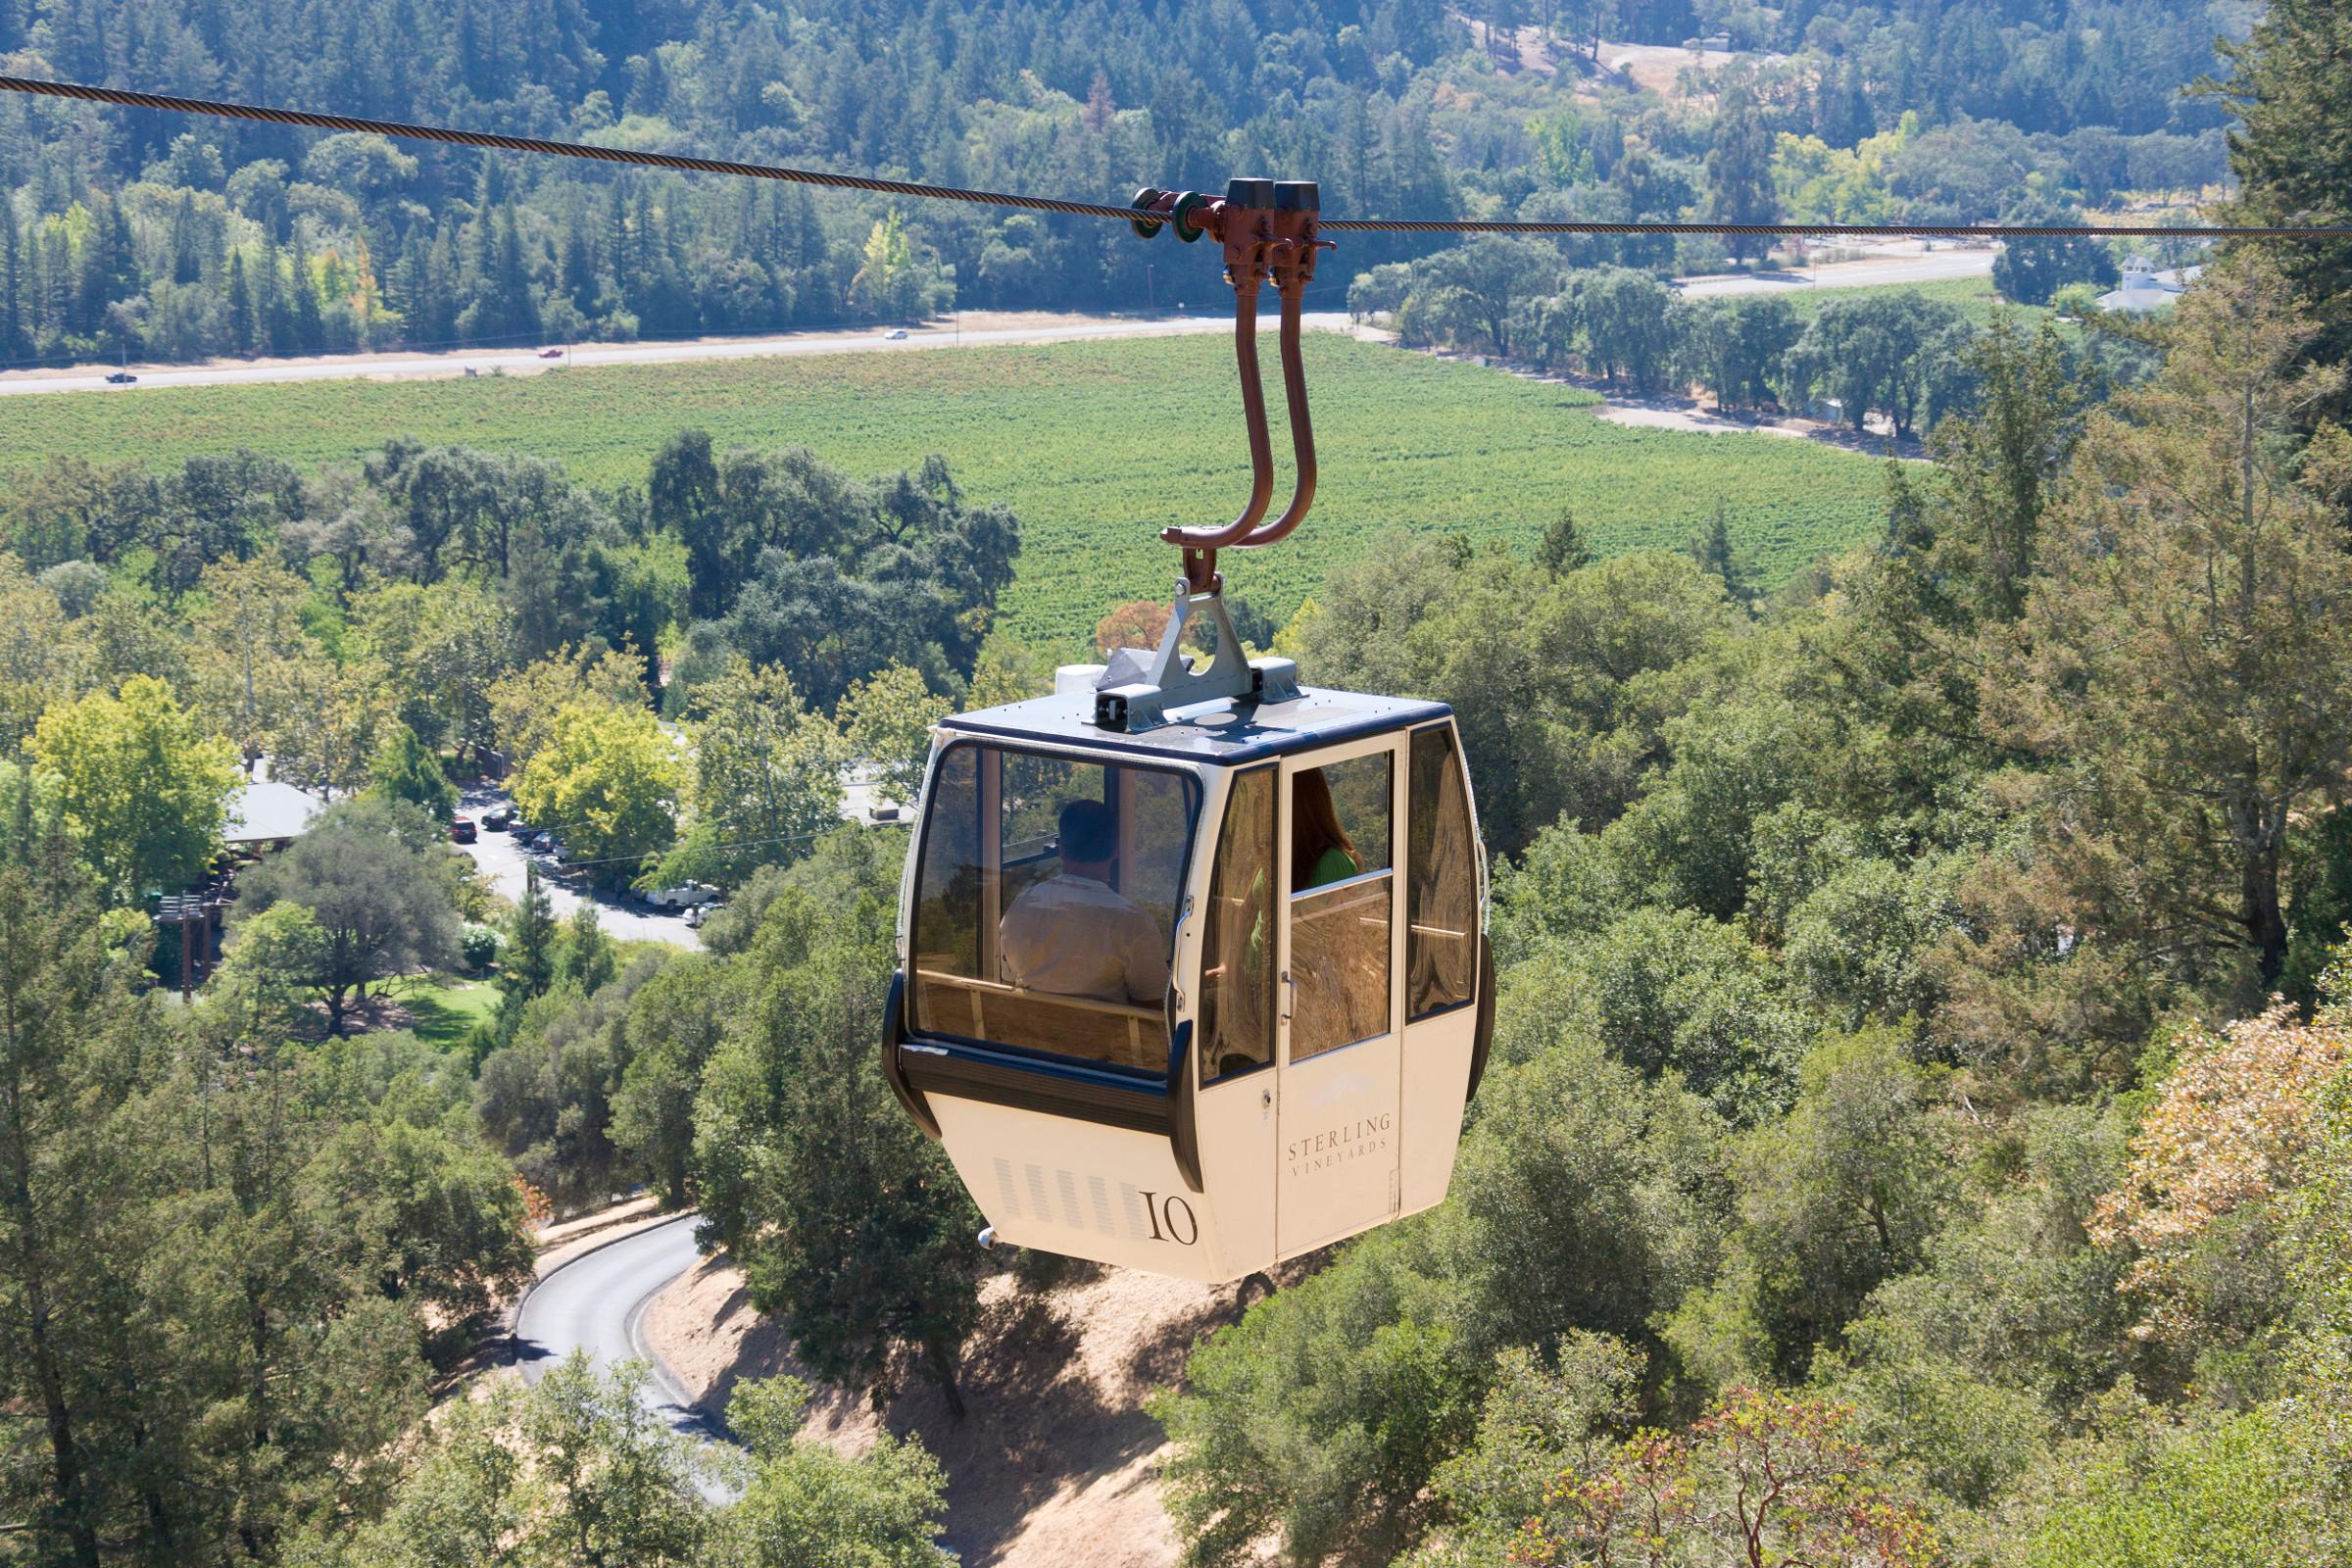 gondola at stirling vineyards